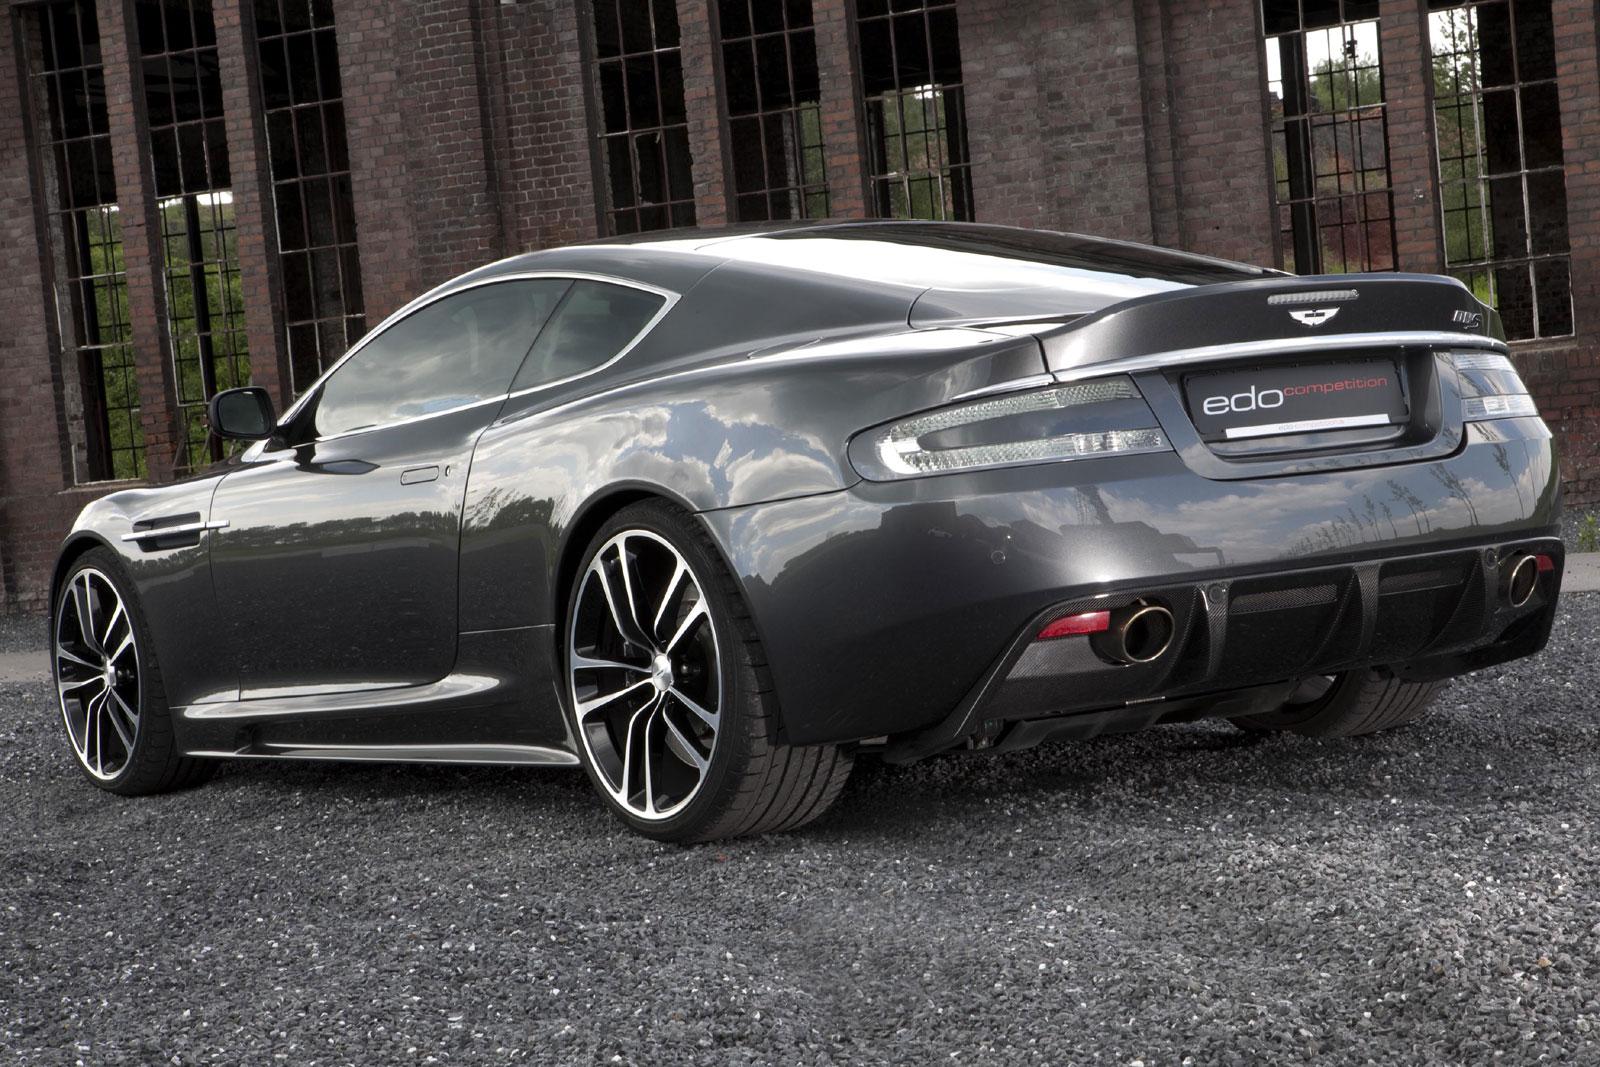 Aston Martin DB9 DBS Edo Competition